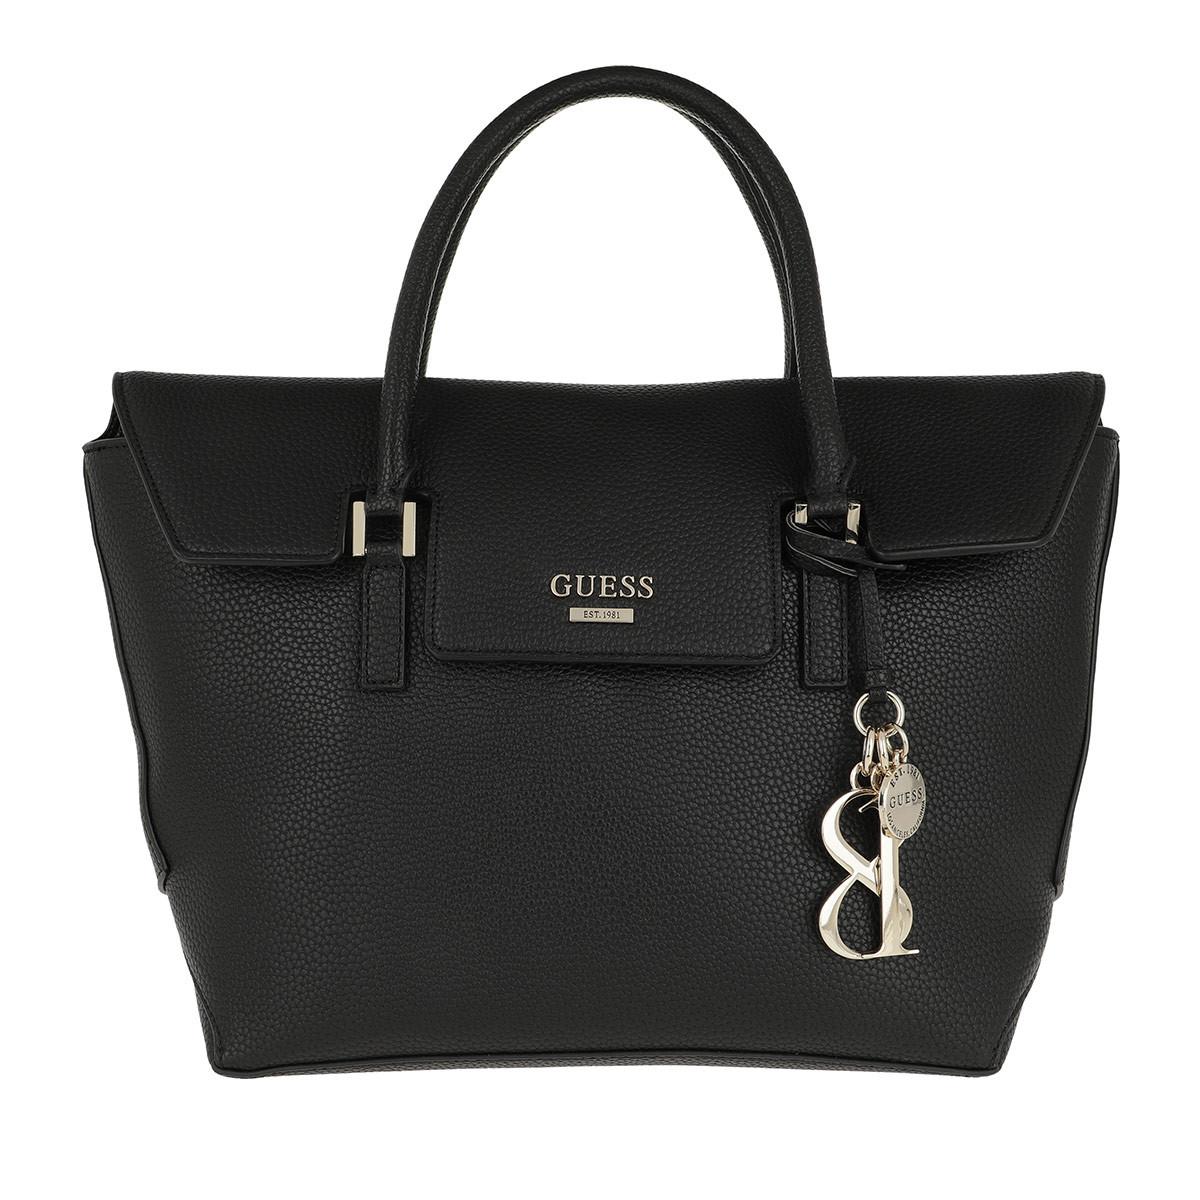 Guess Satchel Bag - West Side Flap Satchel Black - in schwarz - für Damen